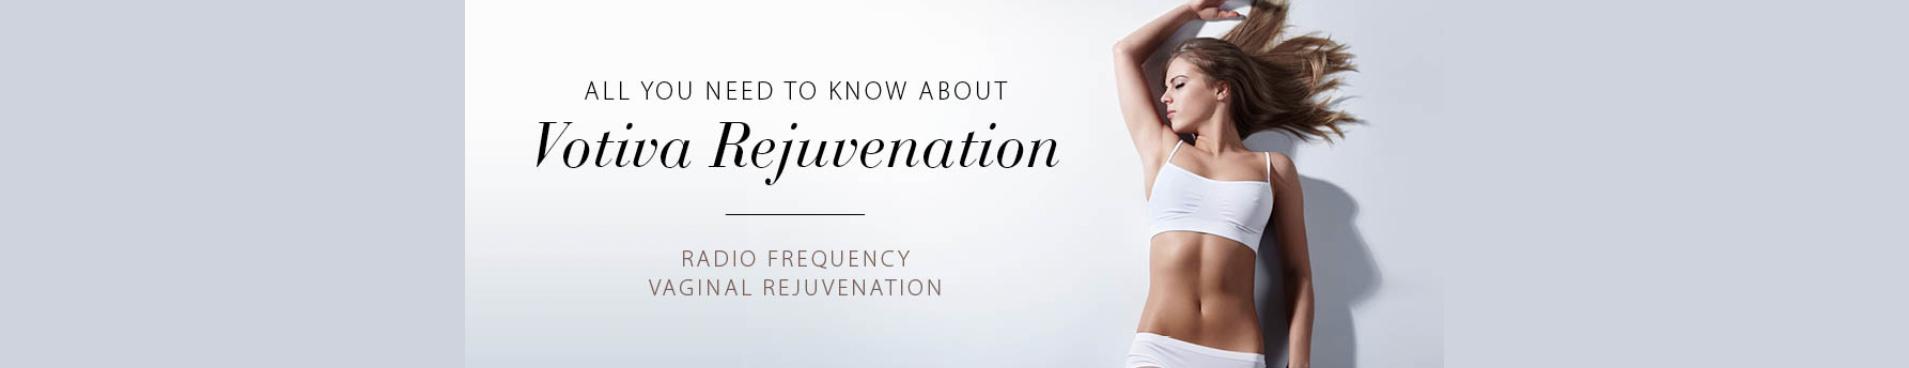 Votiva Rejuvenation Pinehurst Wellness and Urgent Care